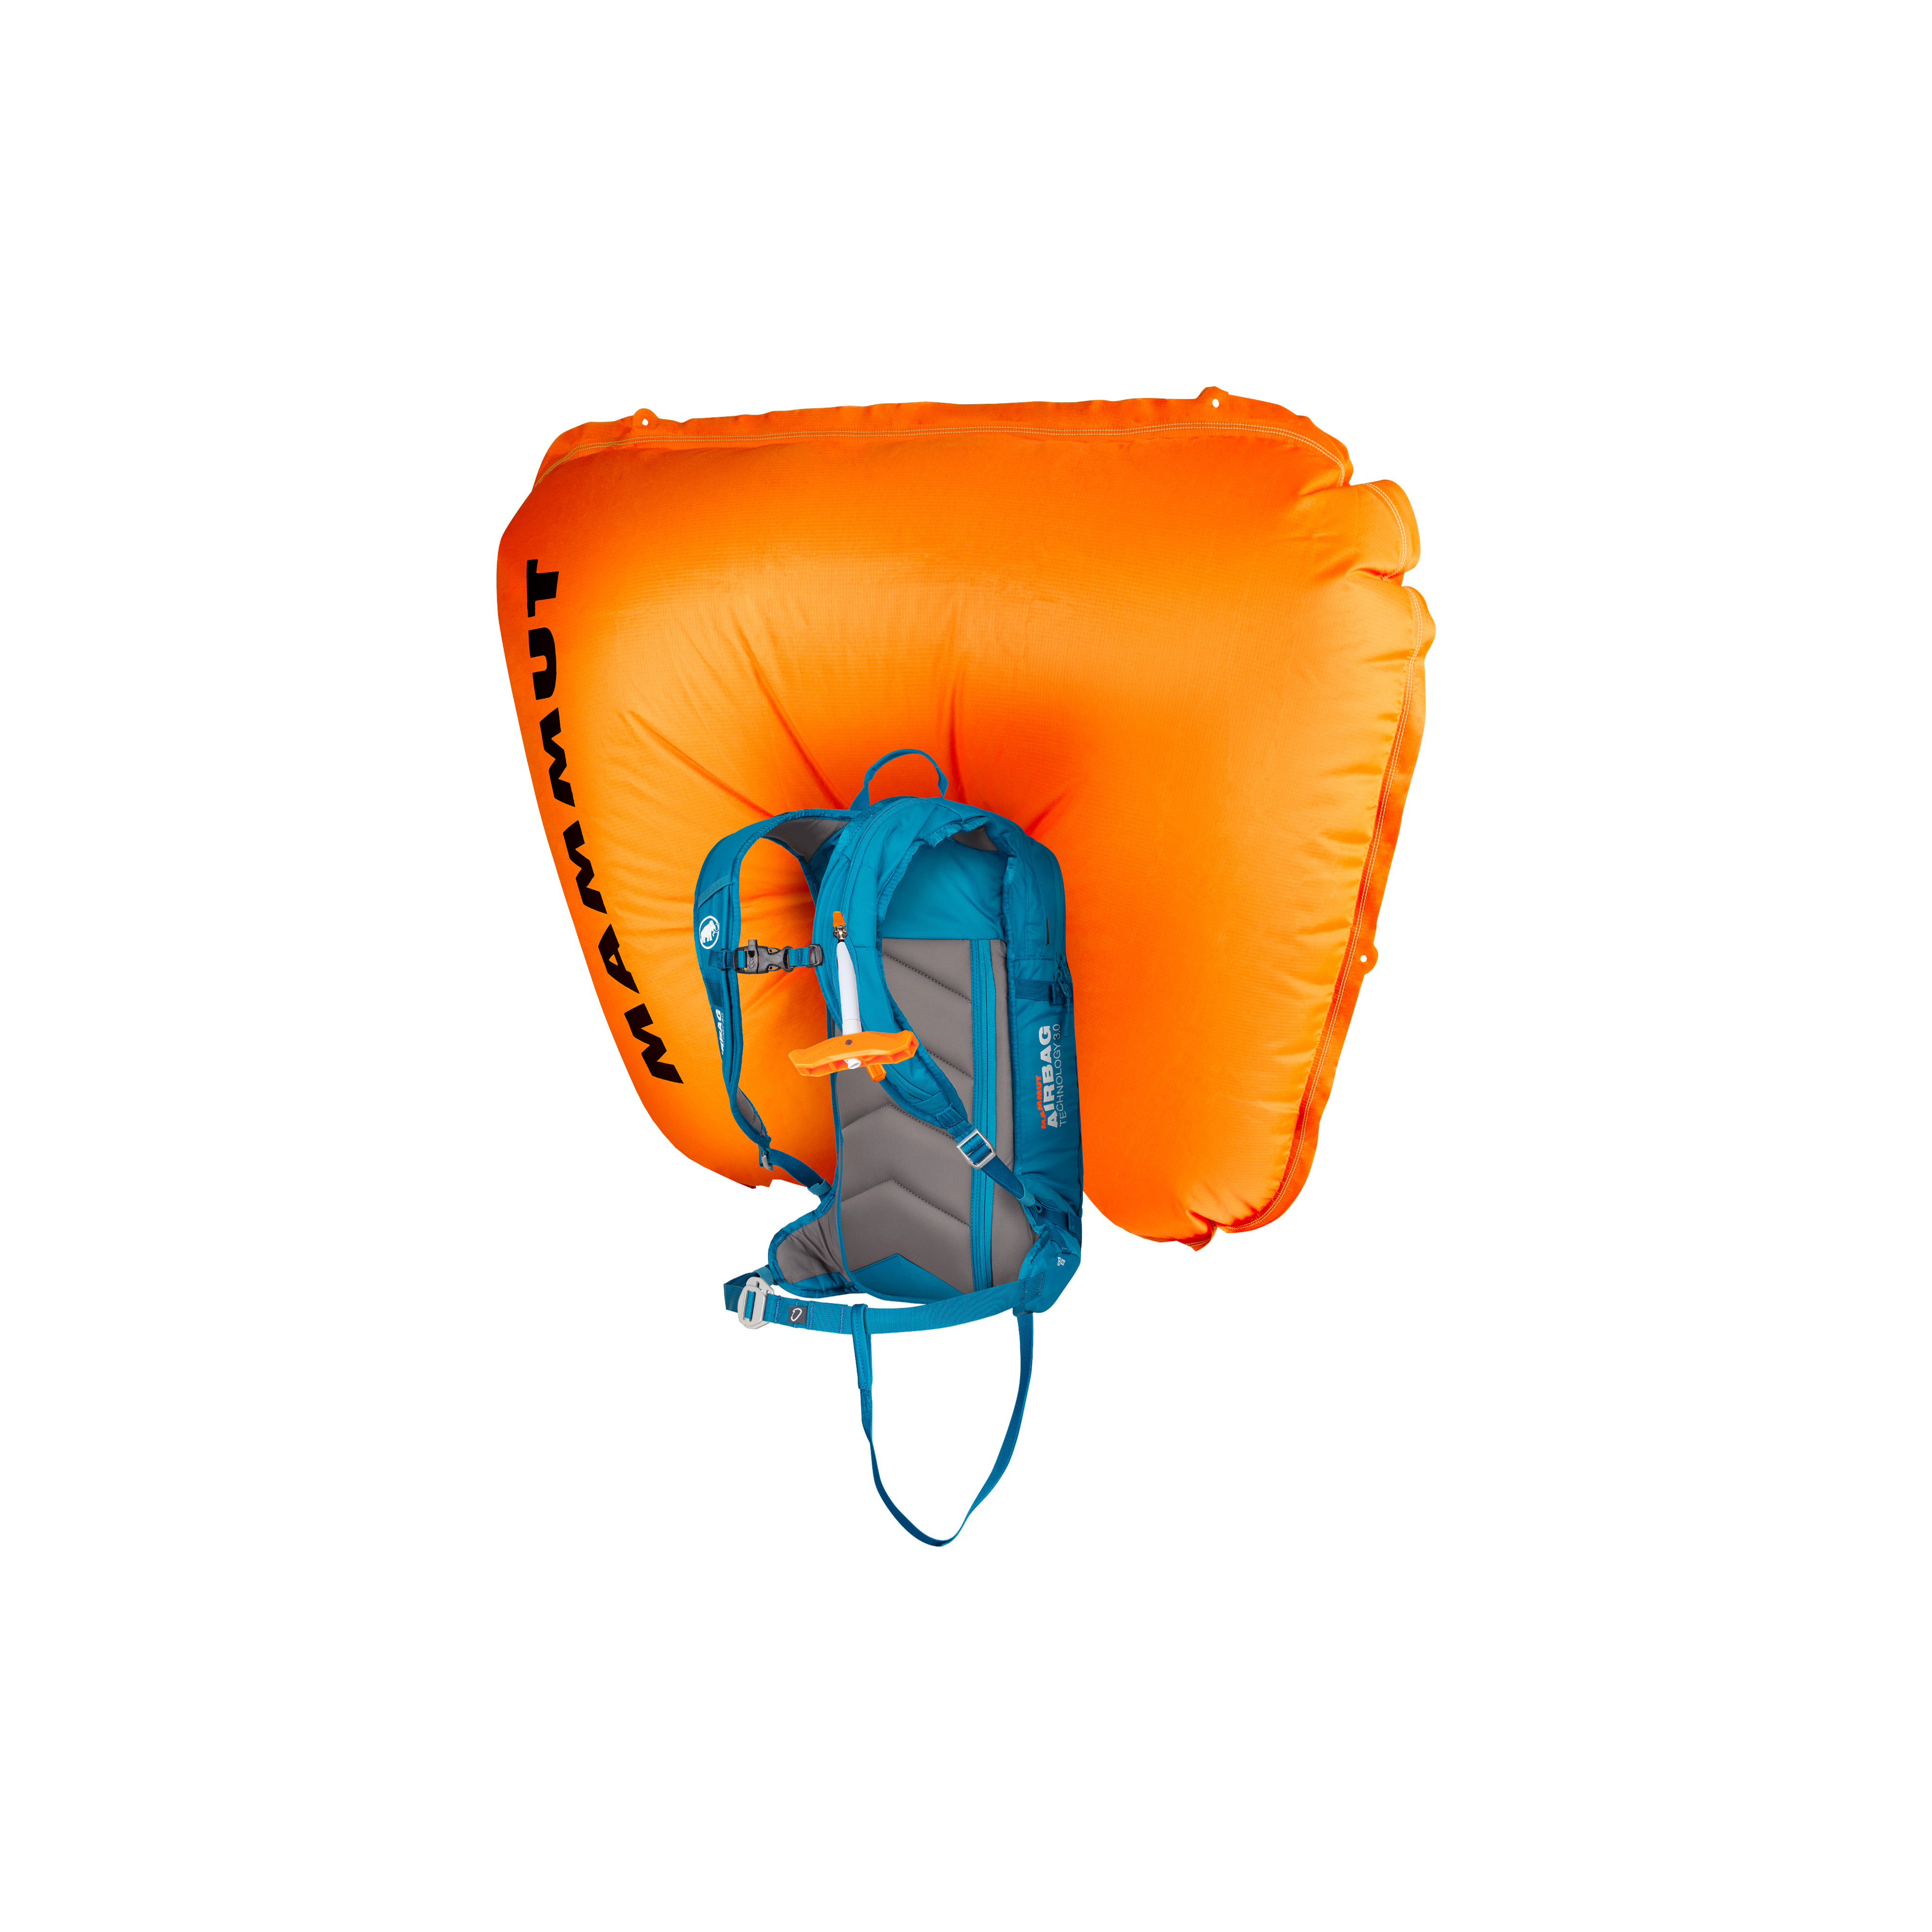 Flip Removable Airbag 3.0 thumbnail